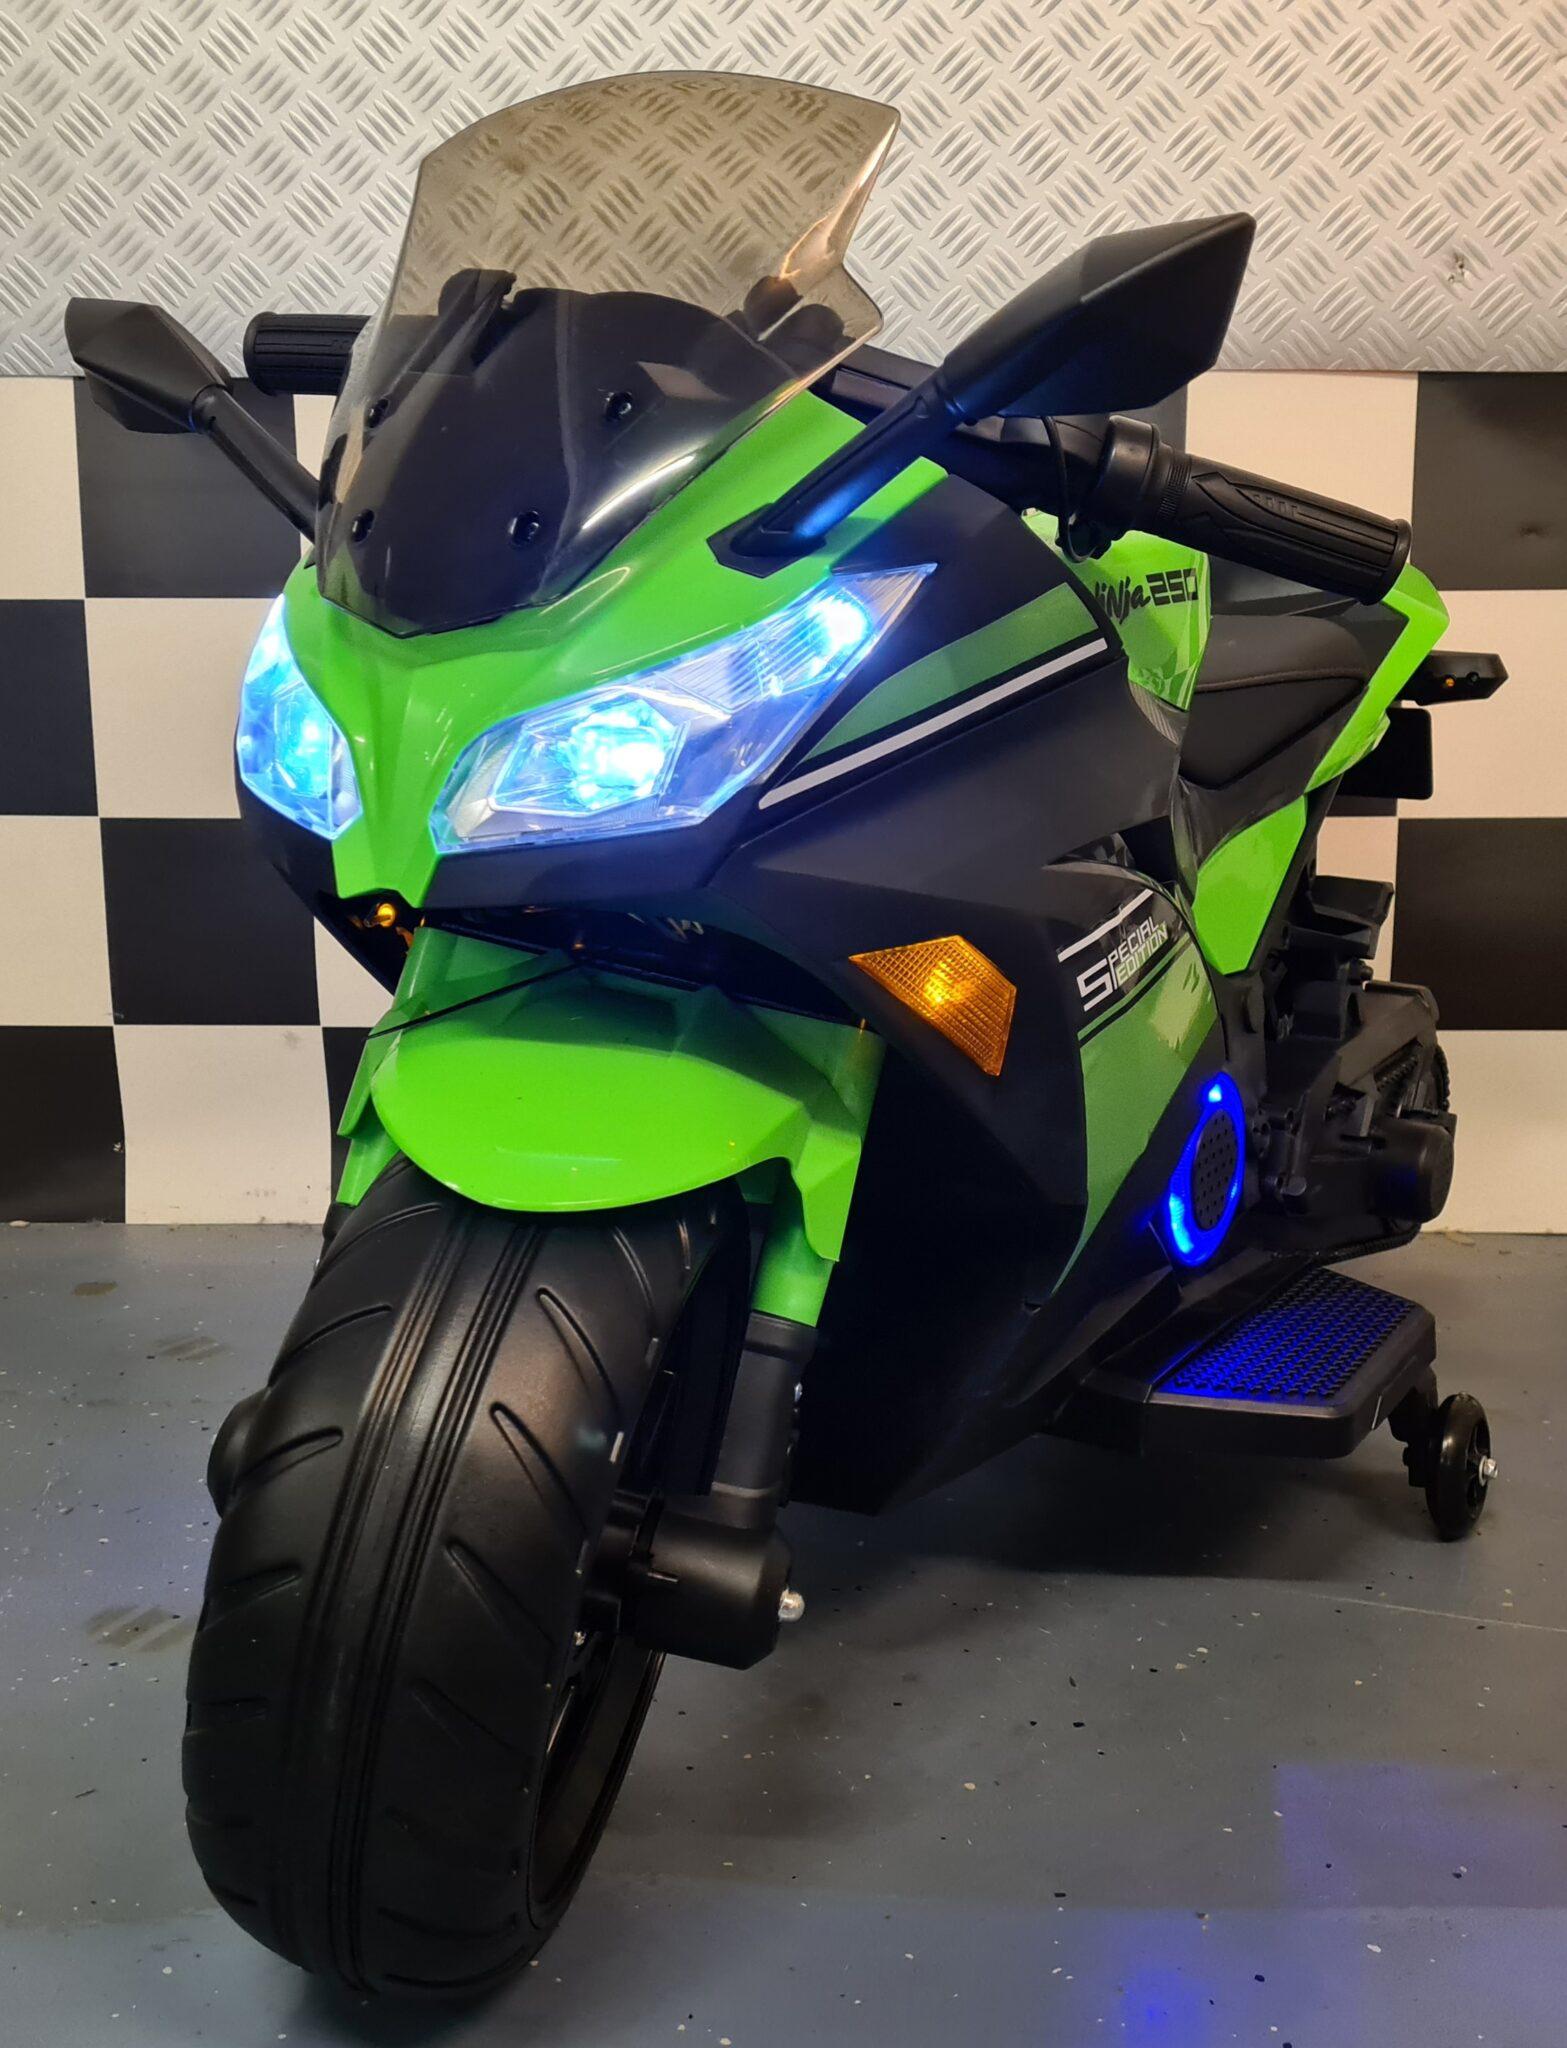 Accu kindermotor Ninja 12 volt groen